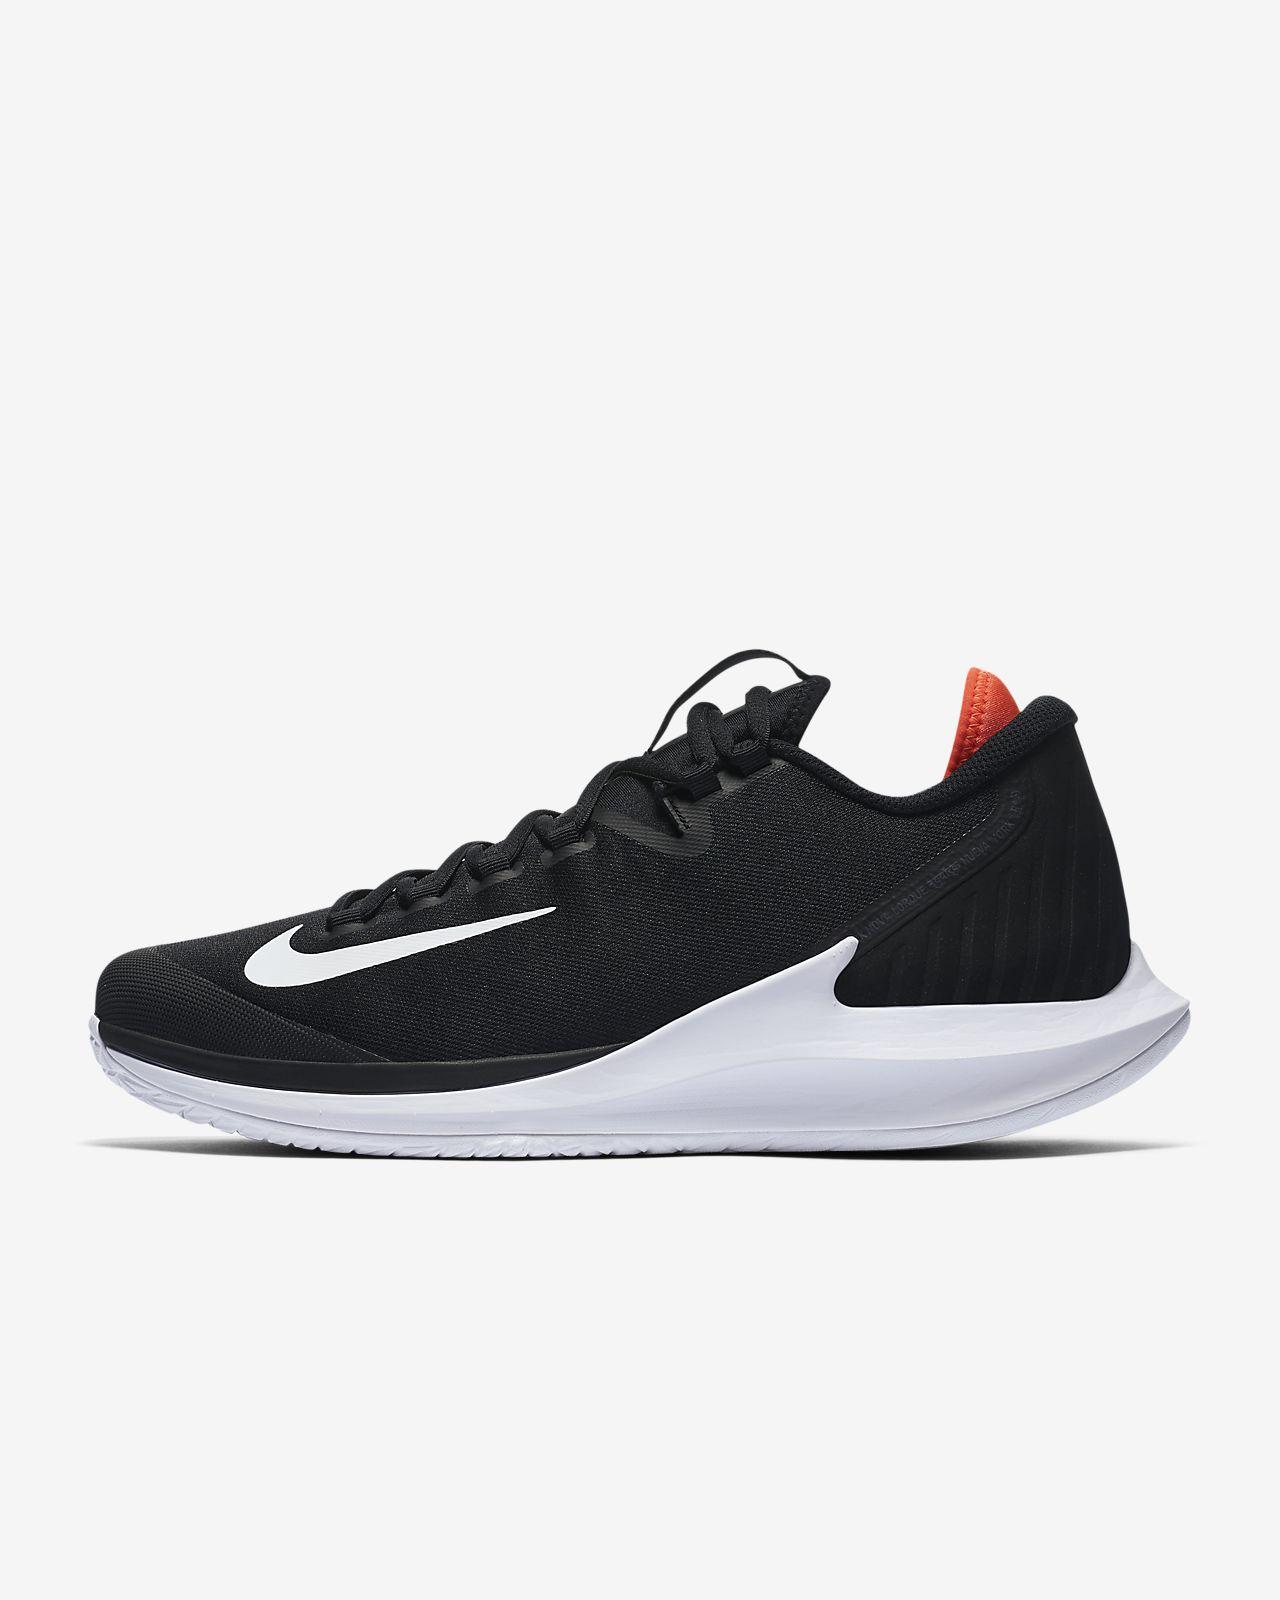 Nike Air Zoom Zero HC Uomo Recensioni e Prezzi Tennis